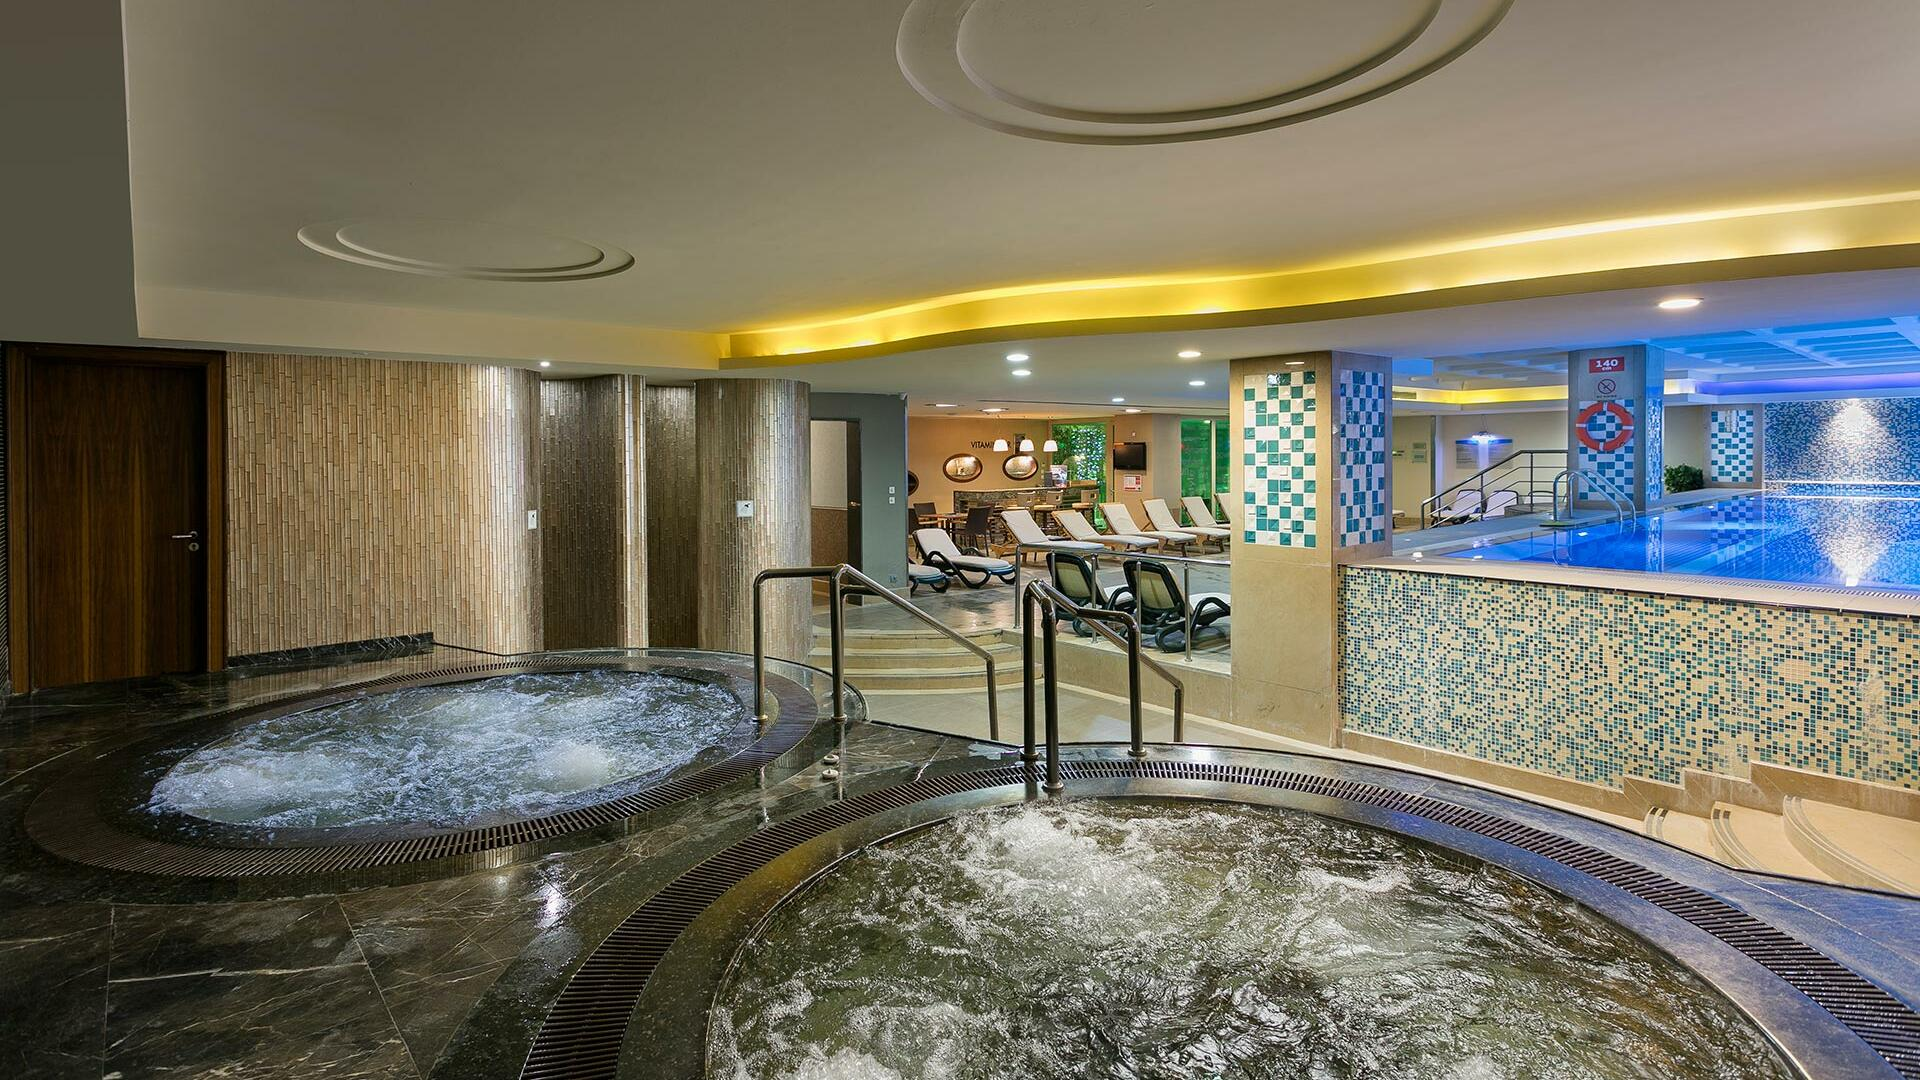 Titanic Port Hotel Bakirkoy